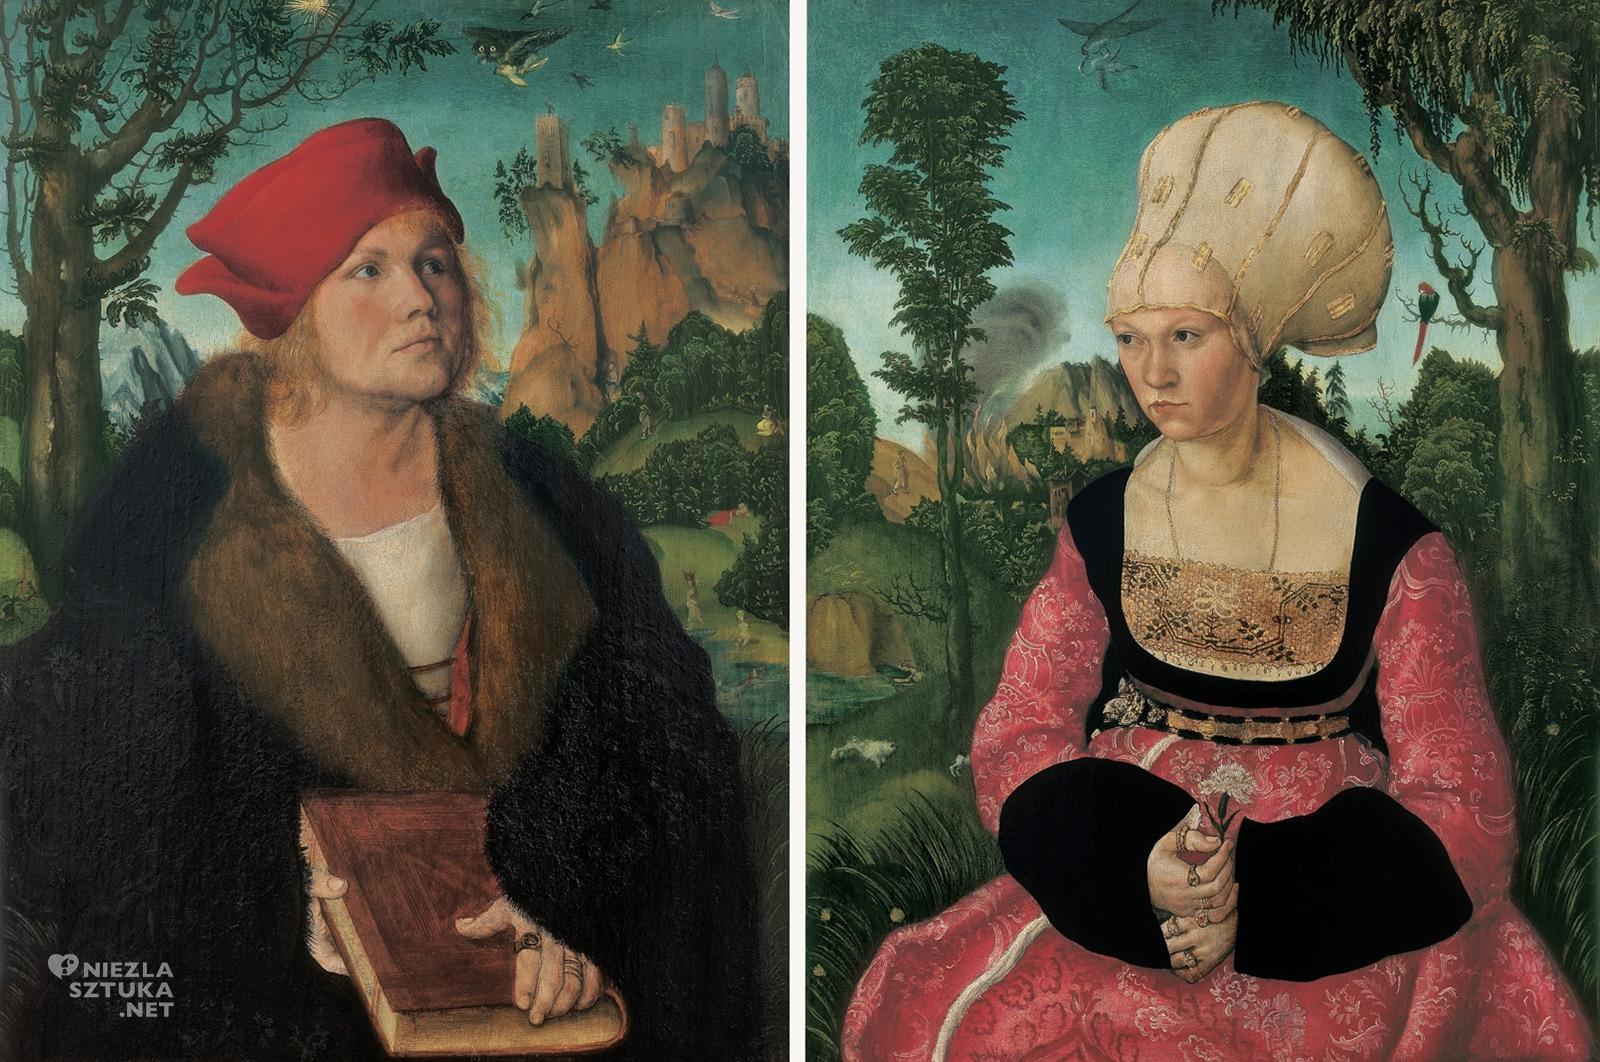 Lucas Cranach starszy, Portret Johannesa i Anny Cuspinianów, Johannes Cuspinian, sztuka niemiecka, Niezła sztuka